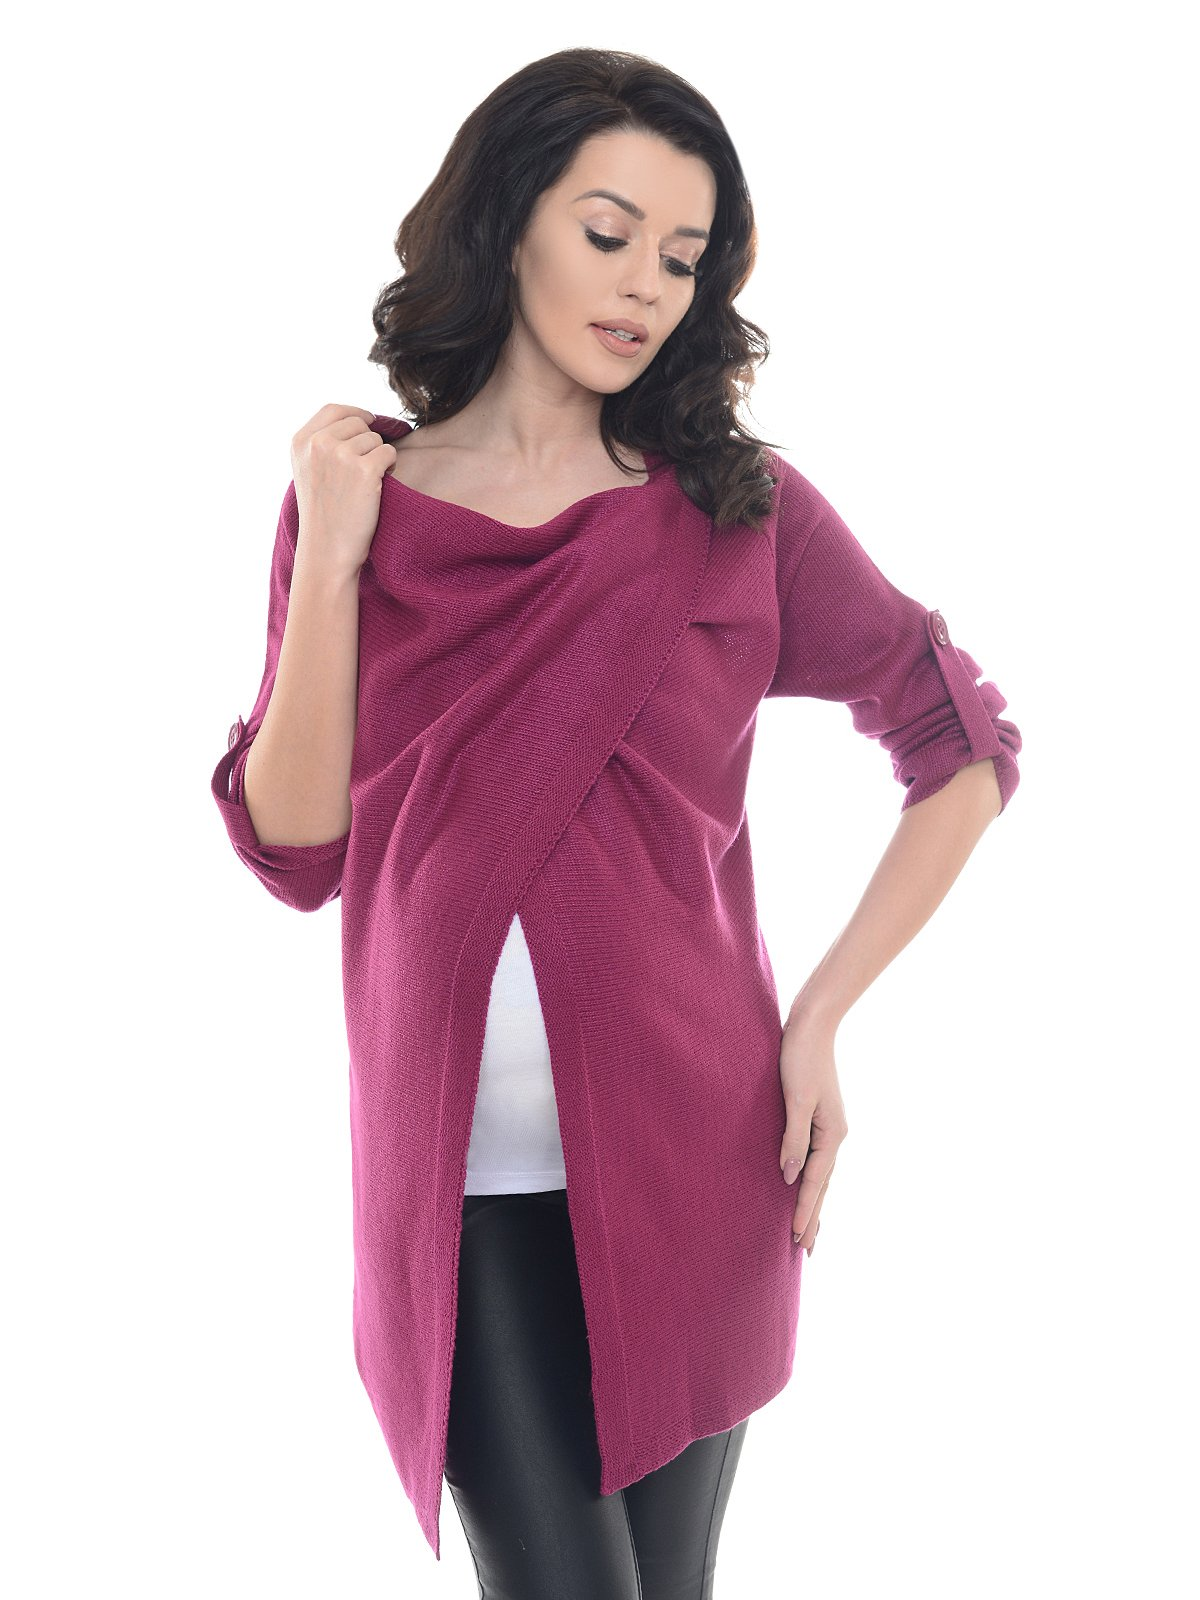 Purpless Maternity Pregnancy and Nursing Cardigan 9001/5 (8/10, Dark Pink)